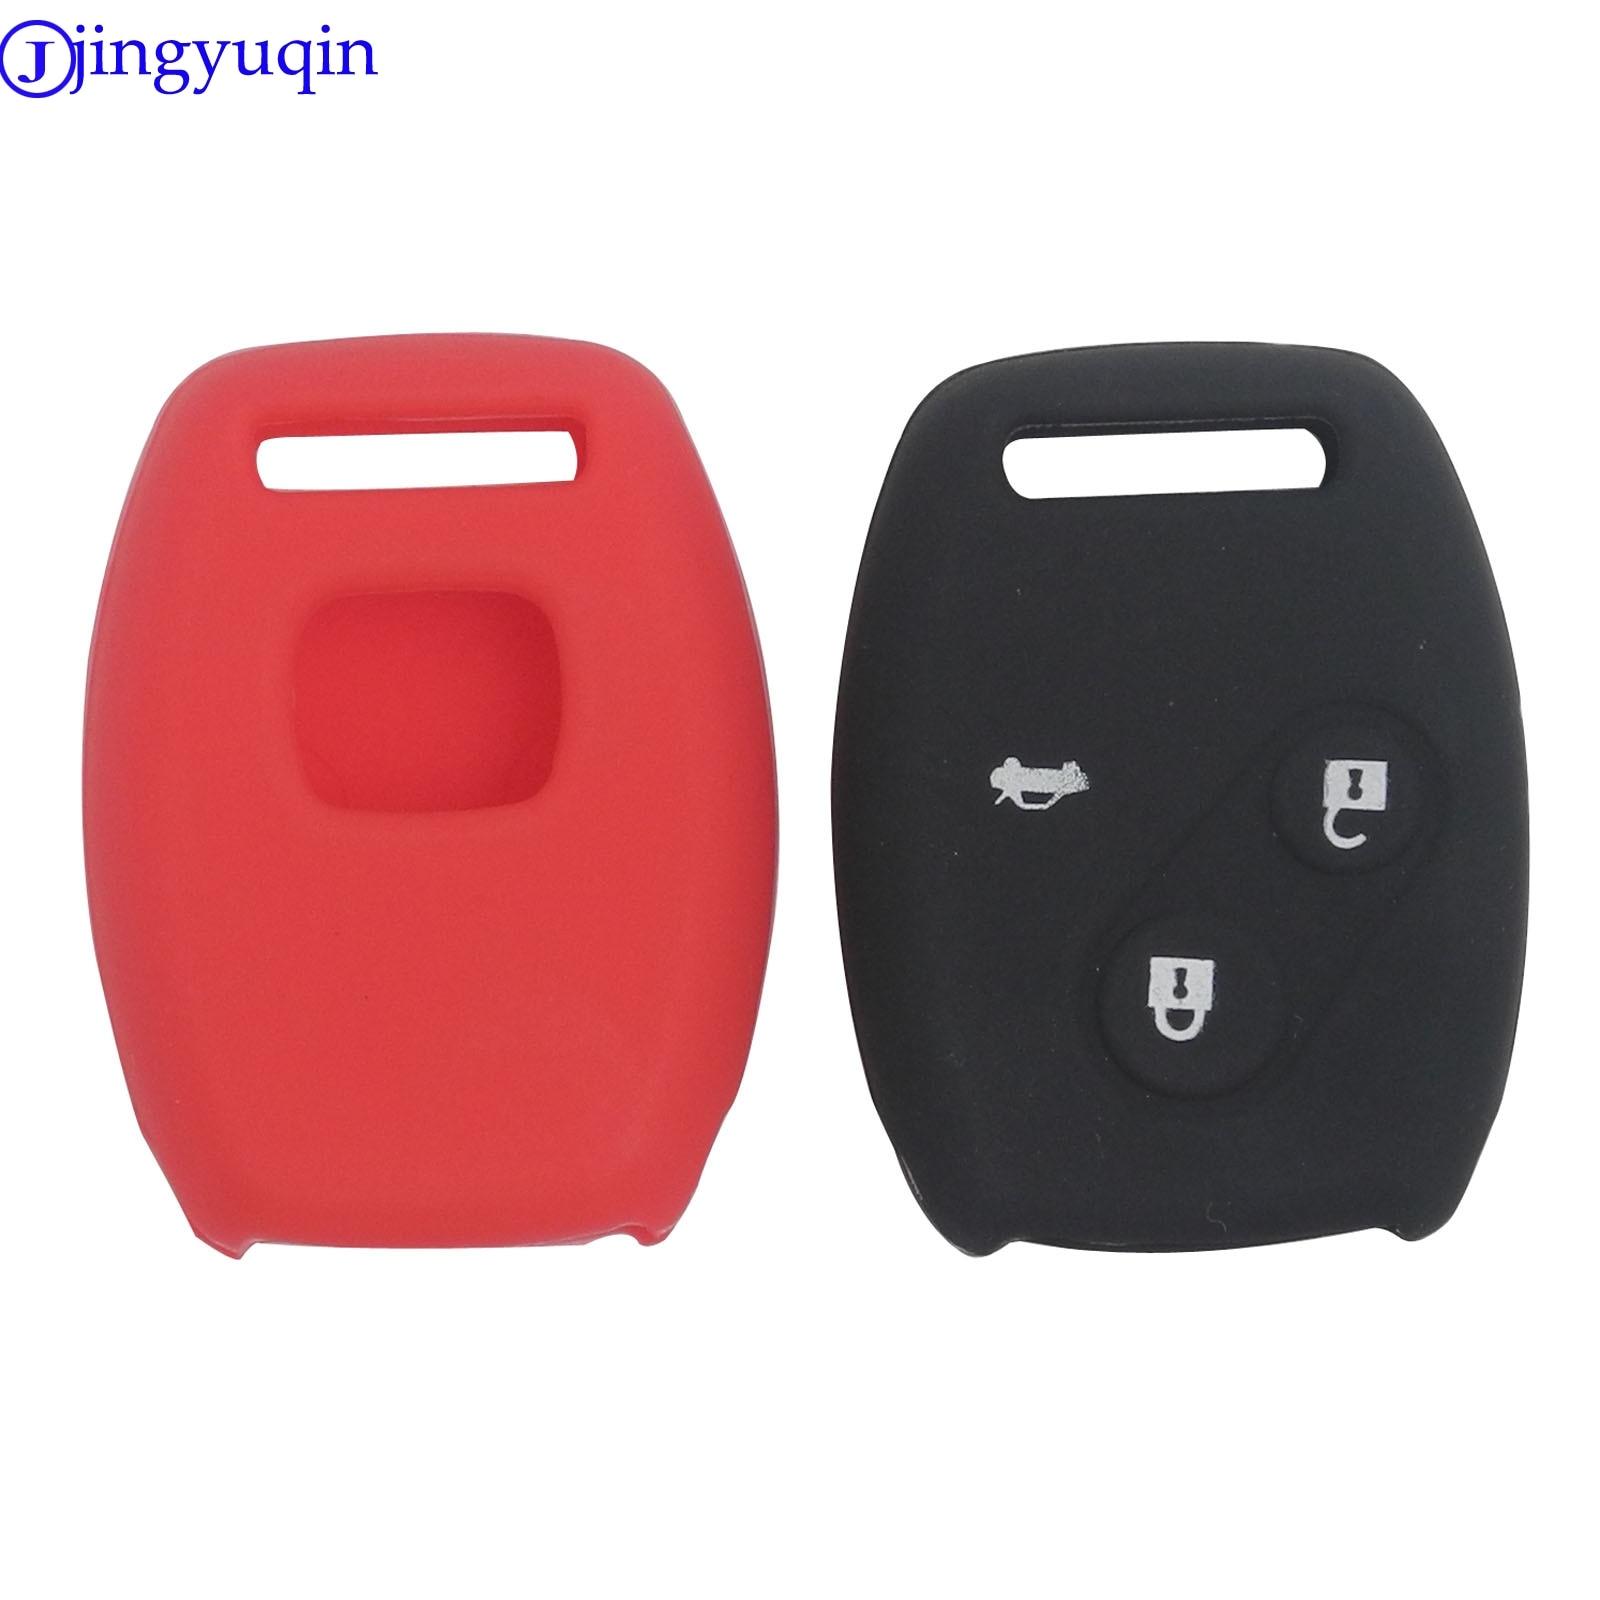 jingyuqin New Silicone Cover Case for HONDA 2003 2008 2009 Accord CR-V CRV Civic Pilot Key Case